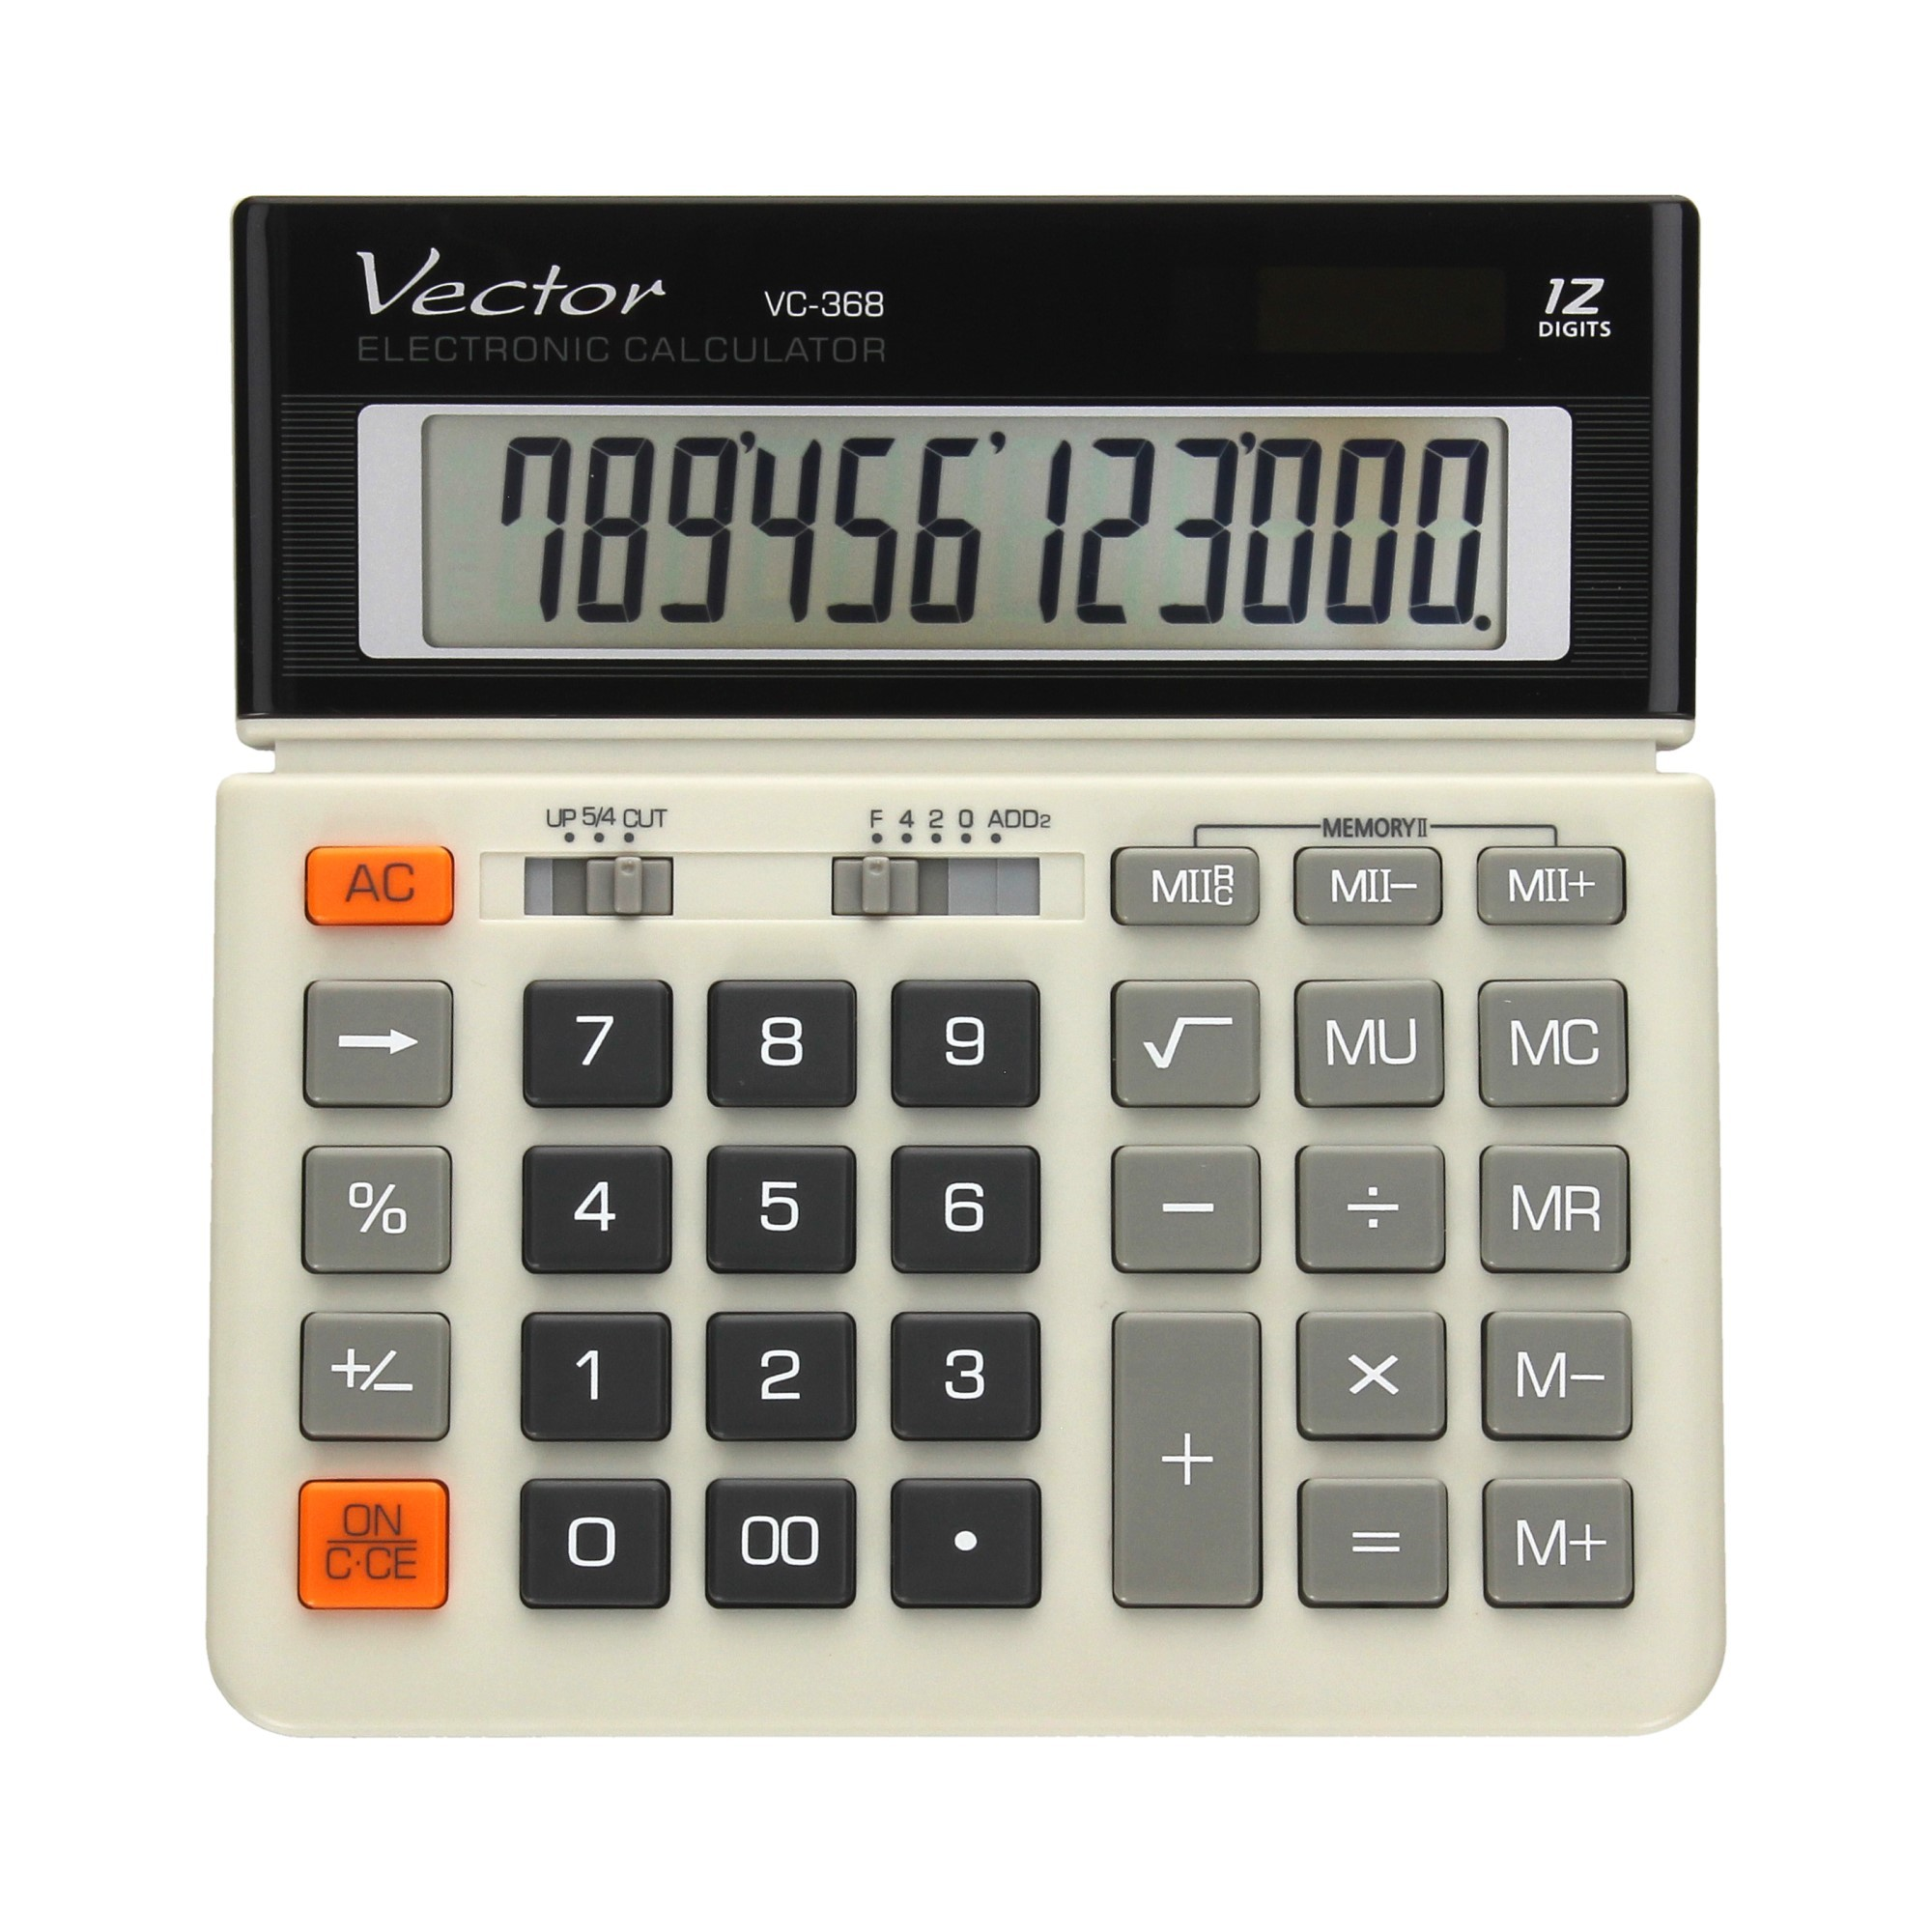 Kalkulator 12pozycyjny VC368 Vector